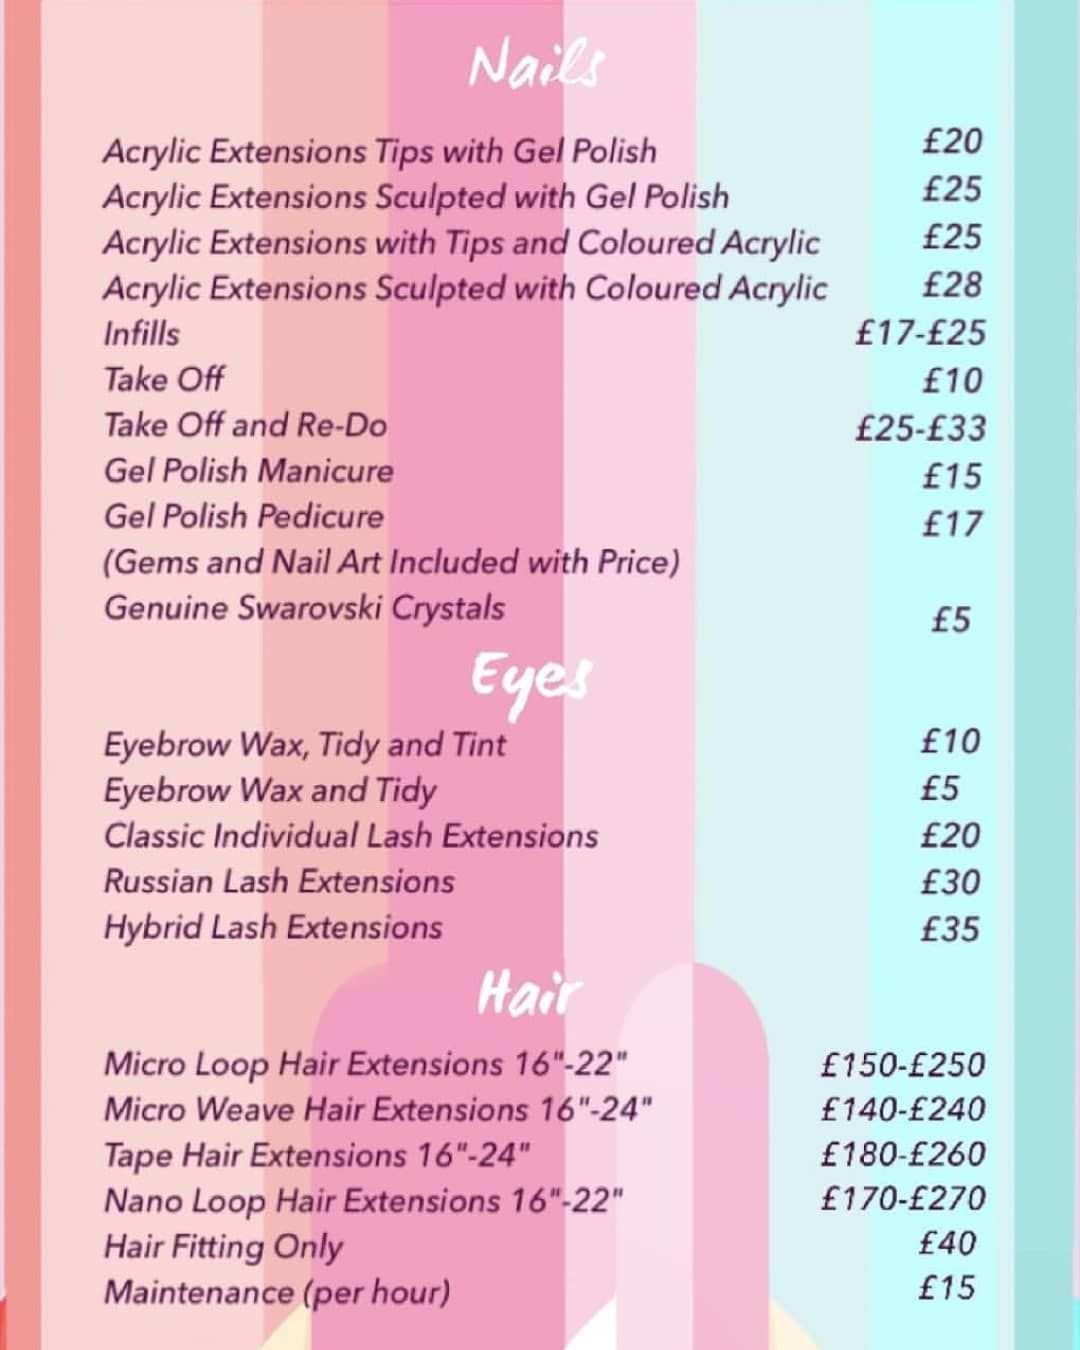 Price List Pricelist Nails Eyes Hair Acrylicnails Gelnails